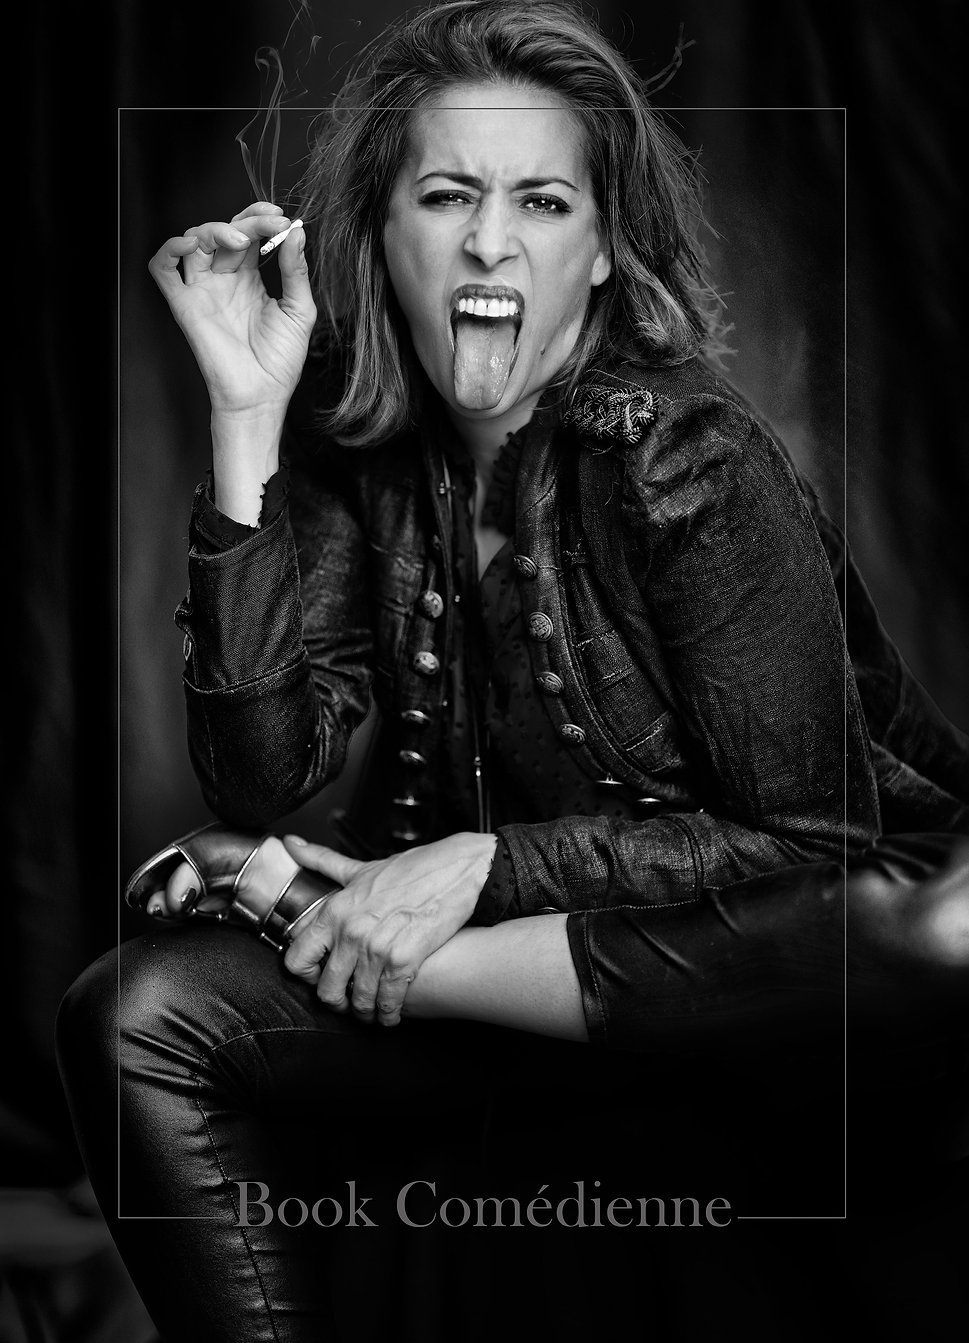 rock,rocknroll,bnw,photography,blackandwhite,expression,smoke,magazine